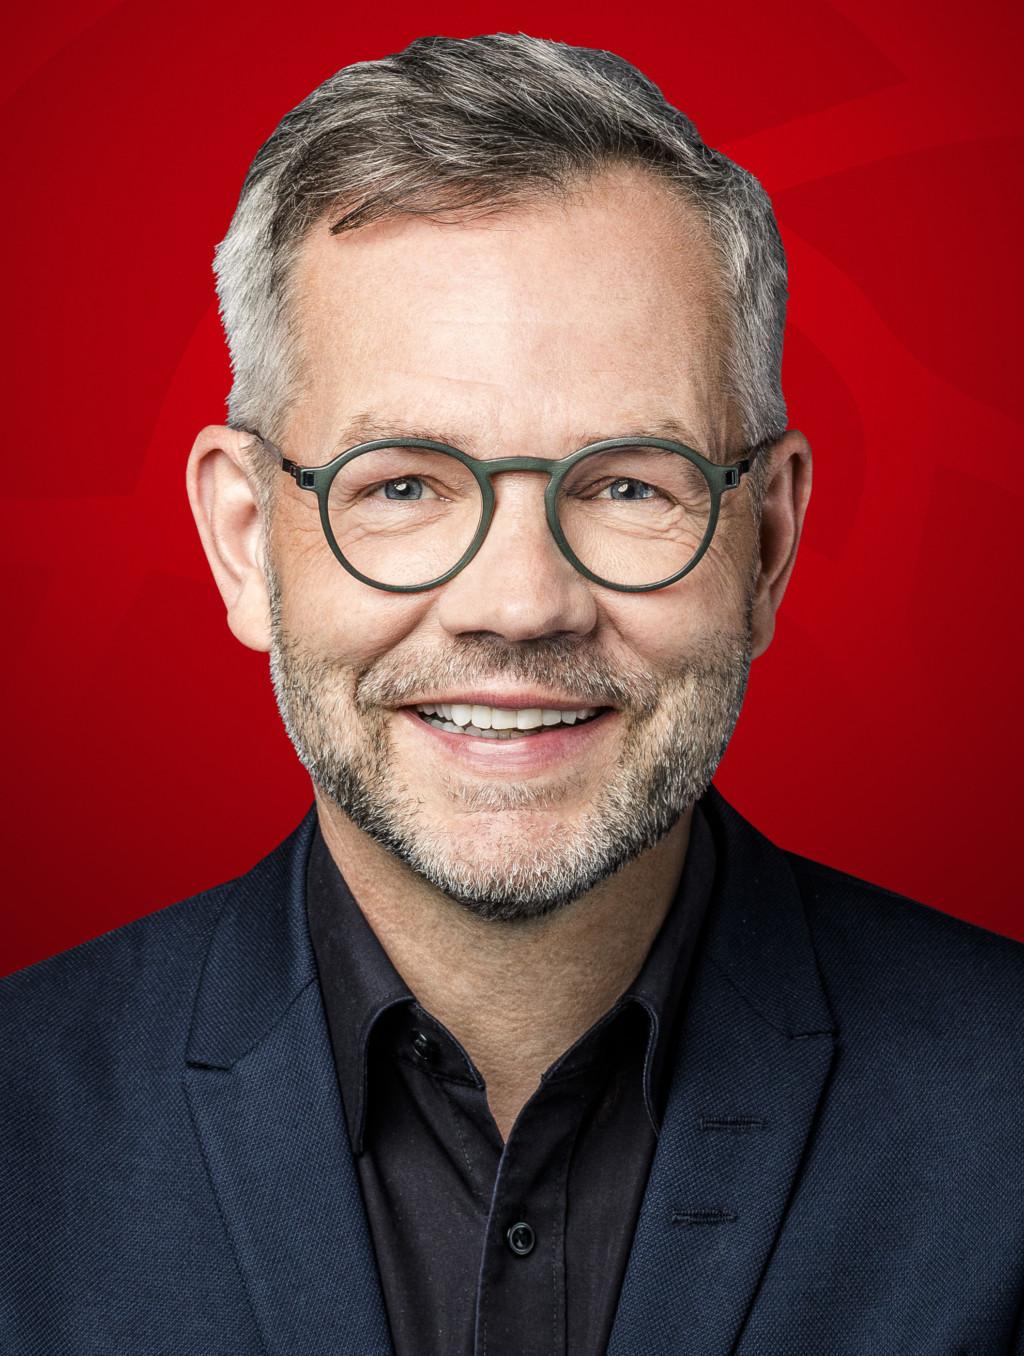 Kandidatenportraet Michael Roth